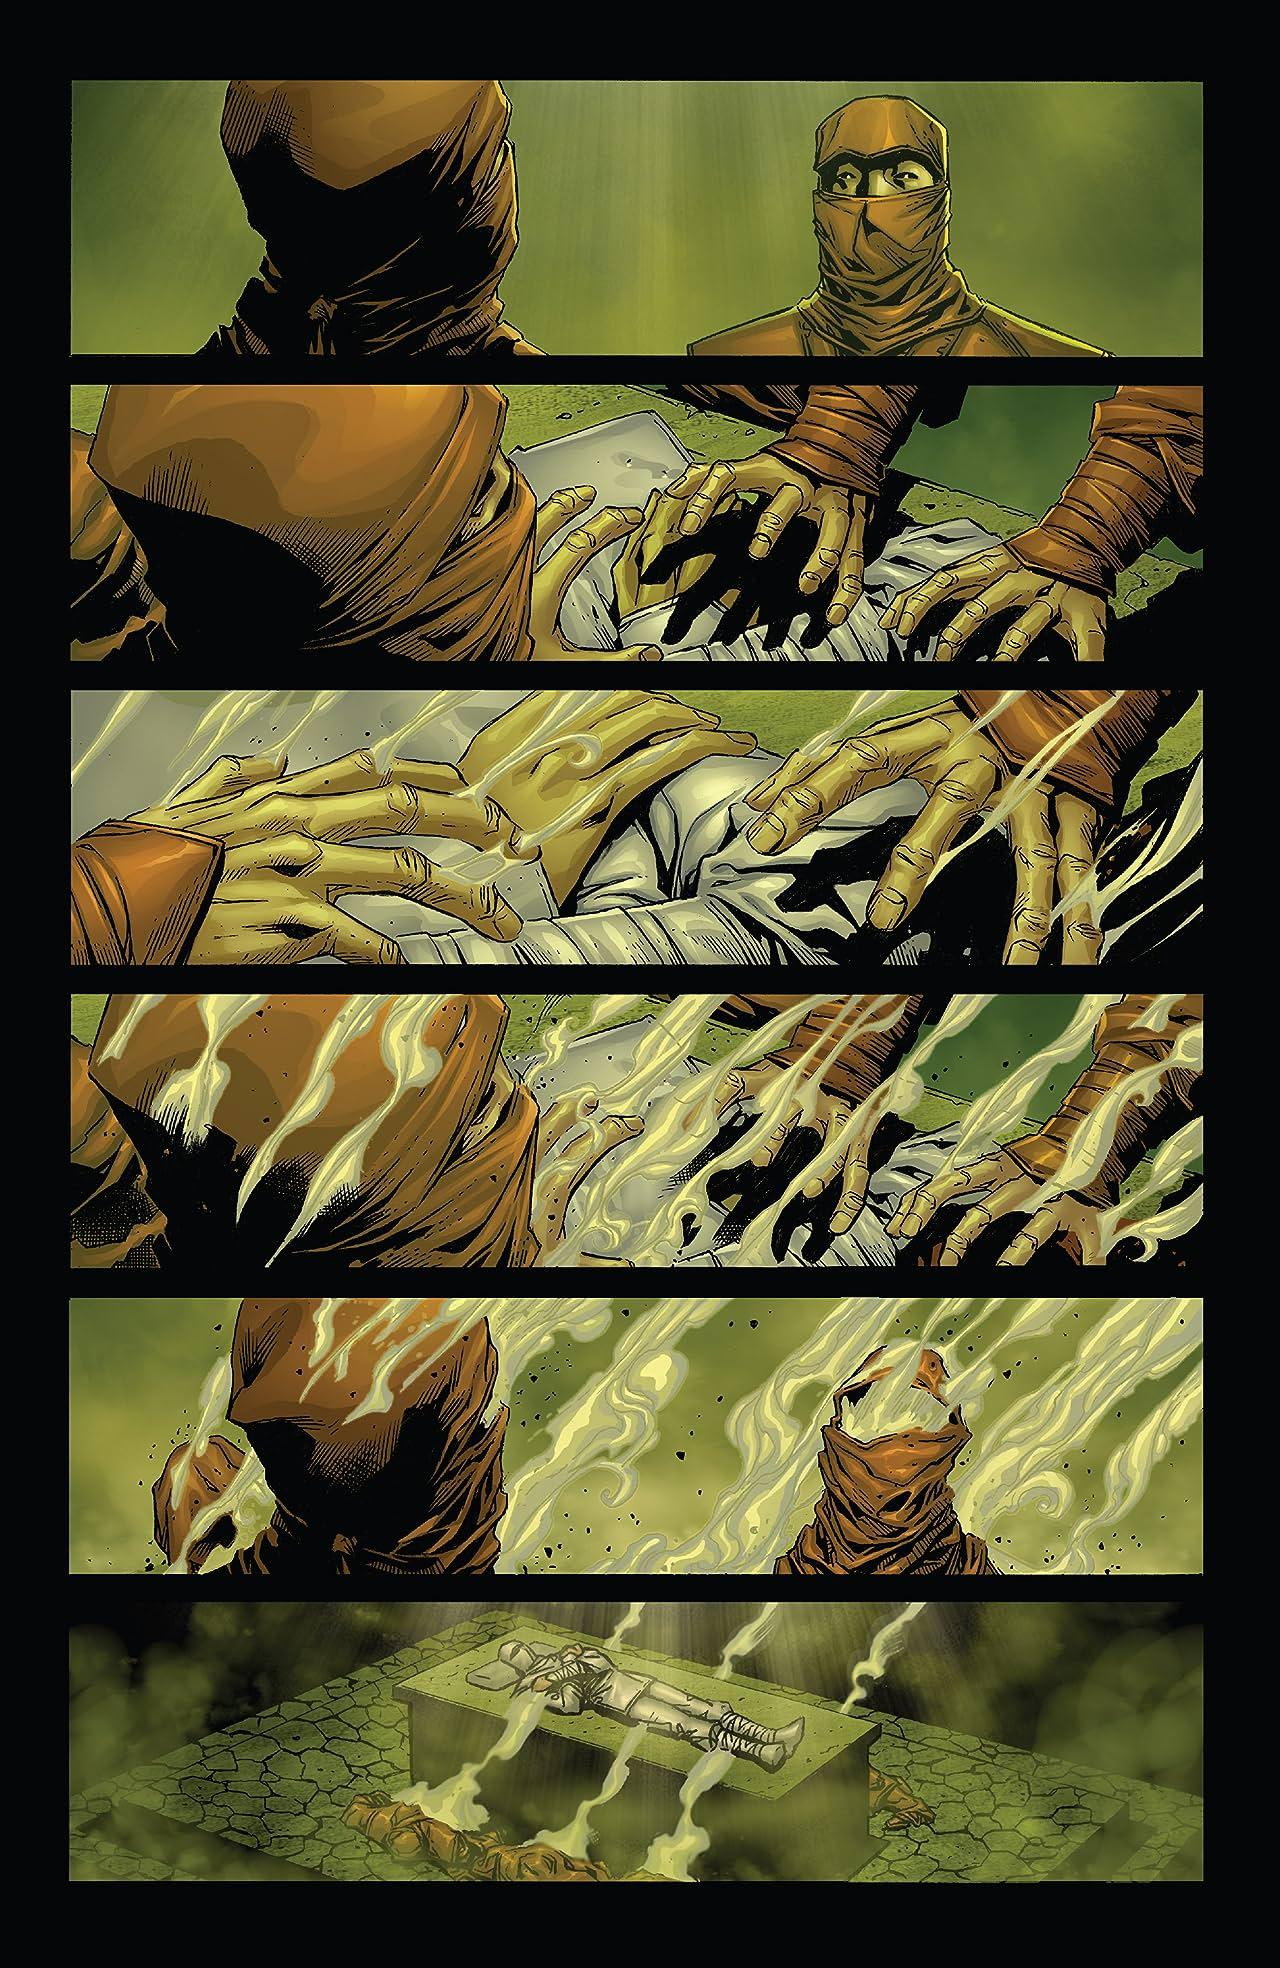 Elektra: The Hand (2004) #1 (of 5)